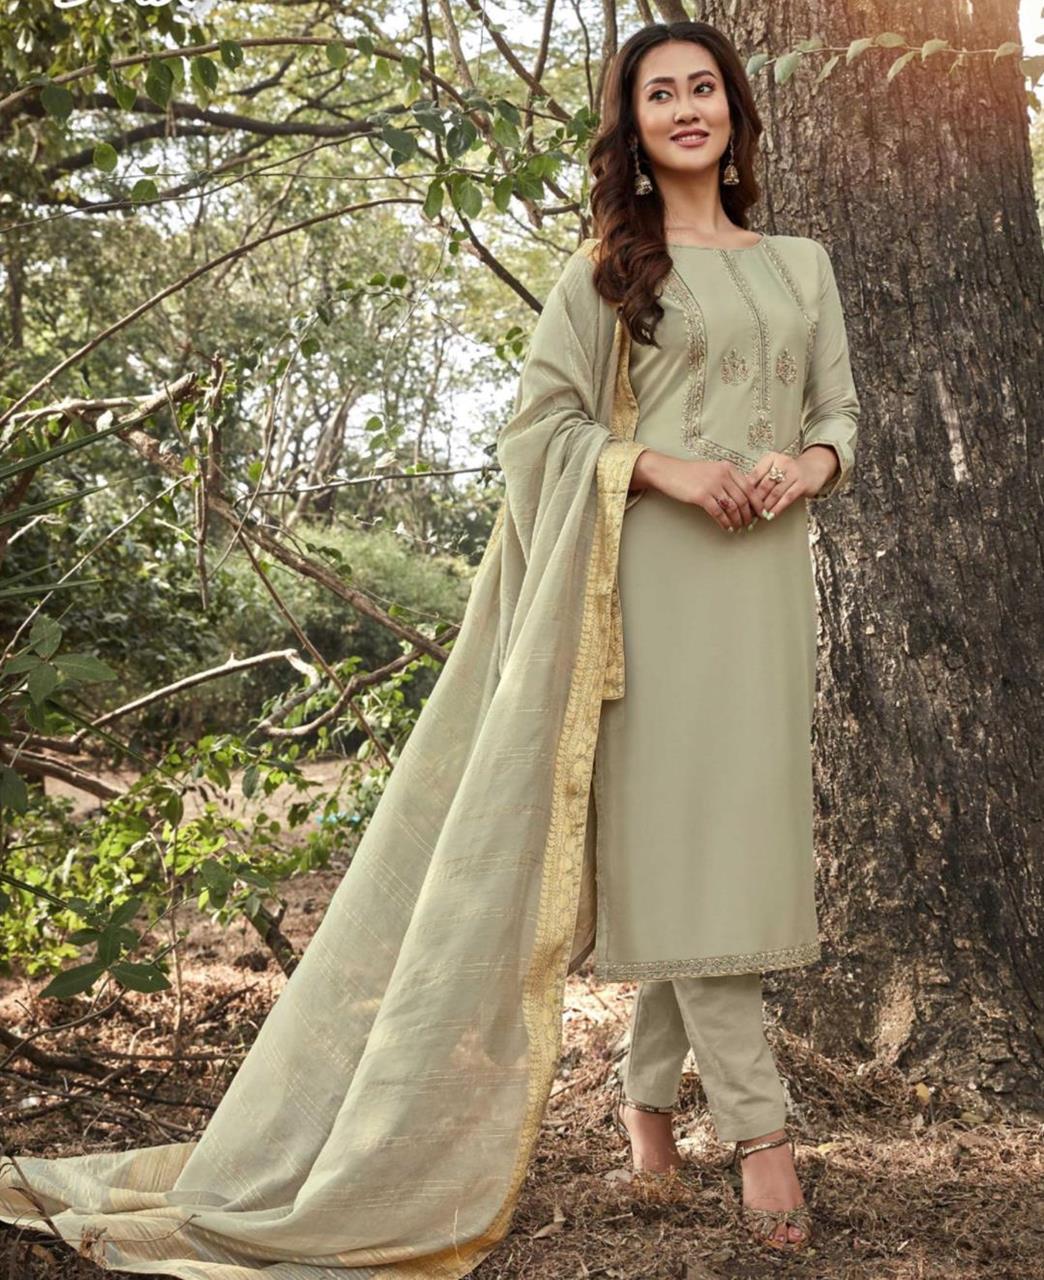 Zari Cotton Straight cut Salwar Kameez in Light Beige